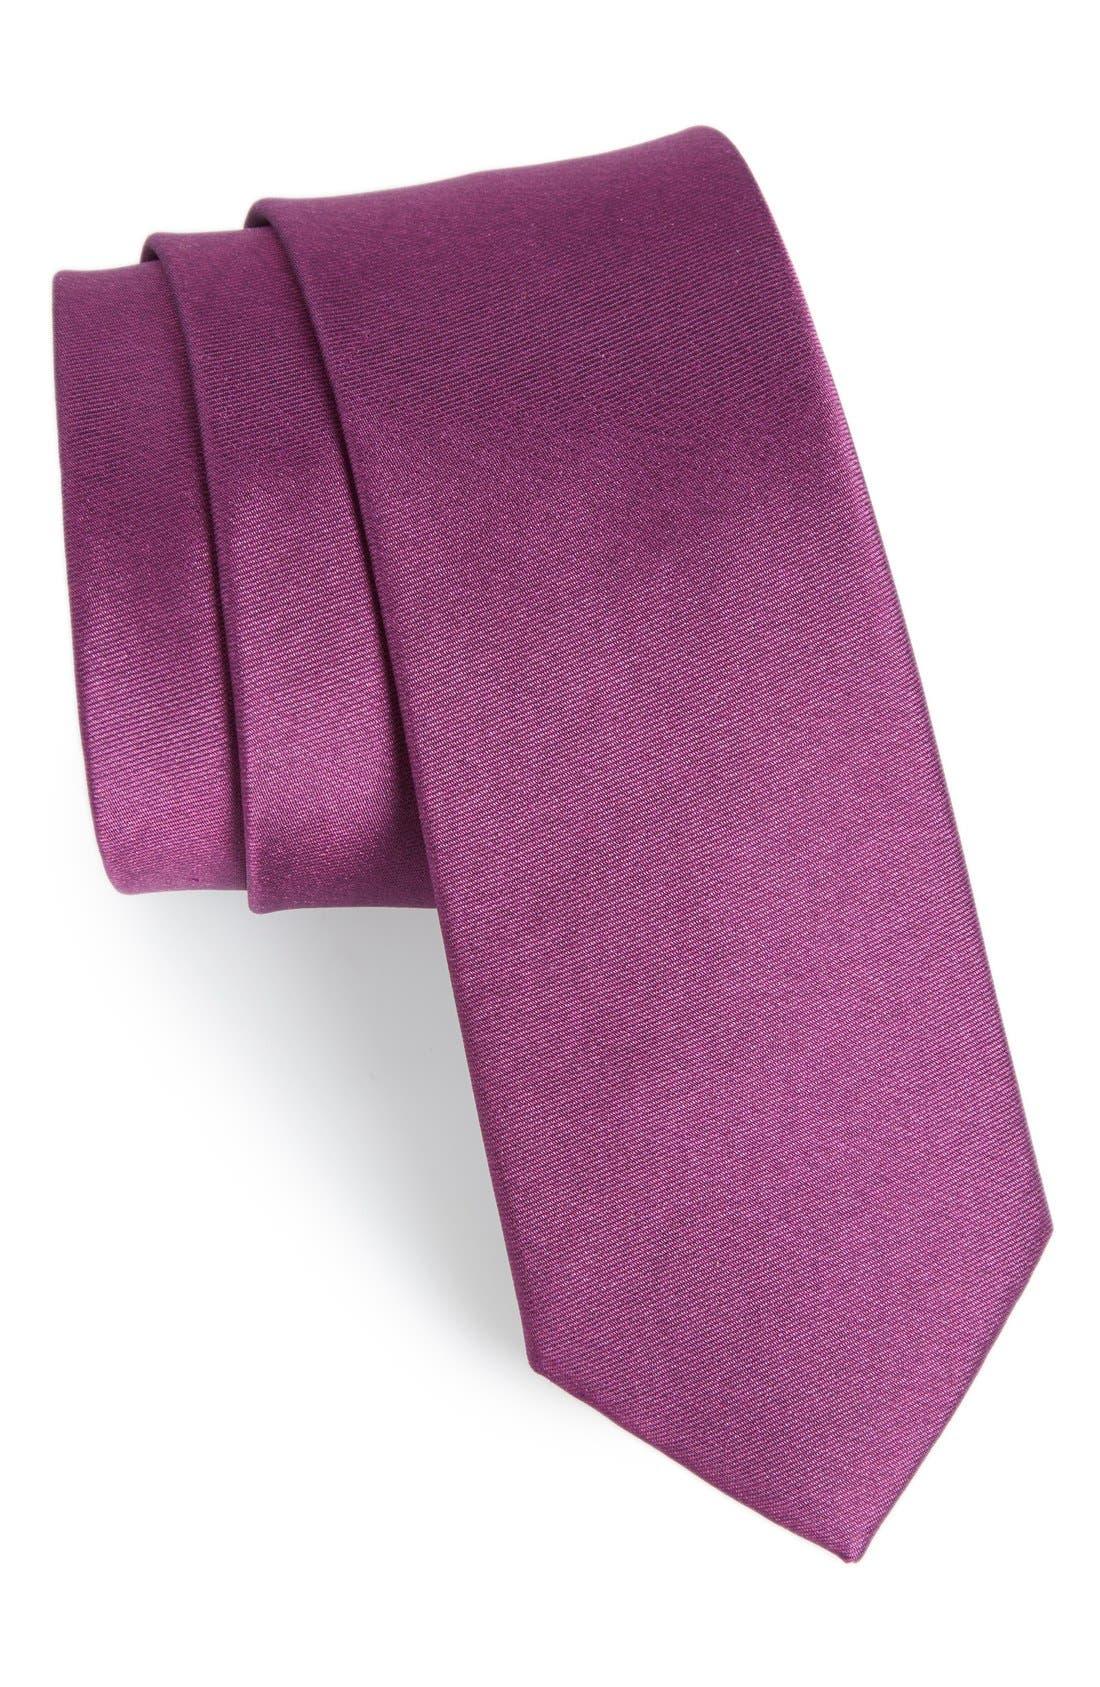 Alternate Image 1 Selected - The Tie Bar Solid Silk Tie